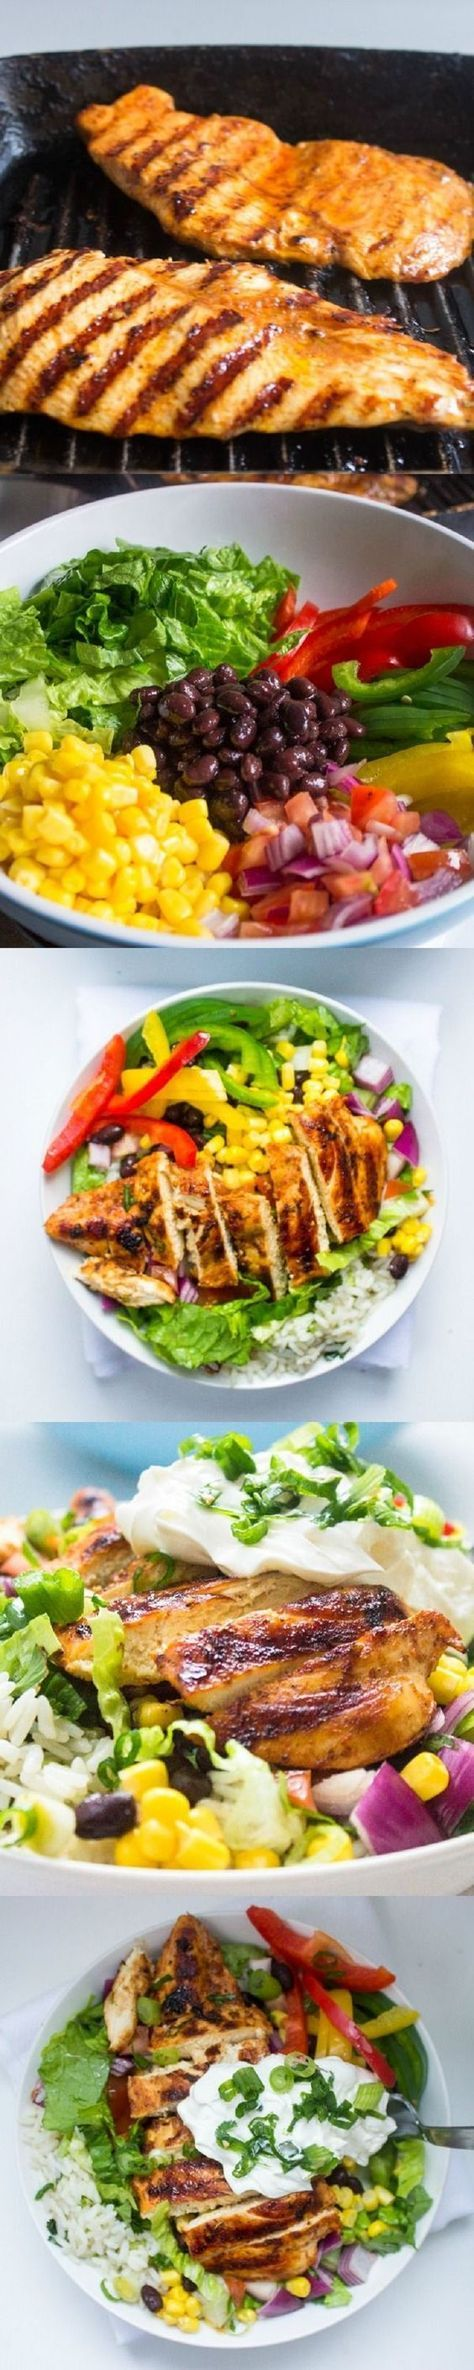 Chipotle's Chicken Burrito Bowl with Cilantro Lime Rice - 15 Most Influential Chipotle Copycat Recipes   GleamItUp